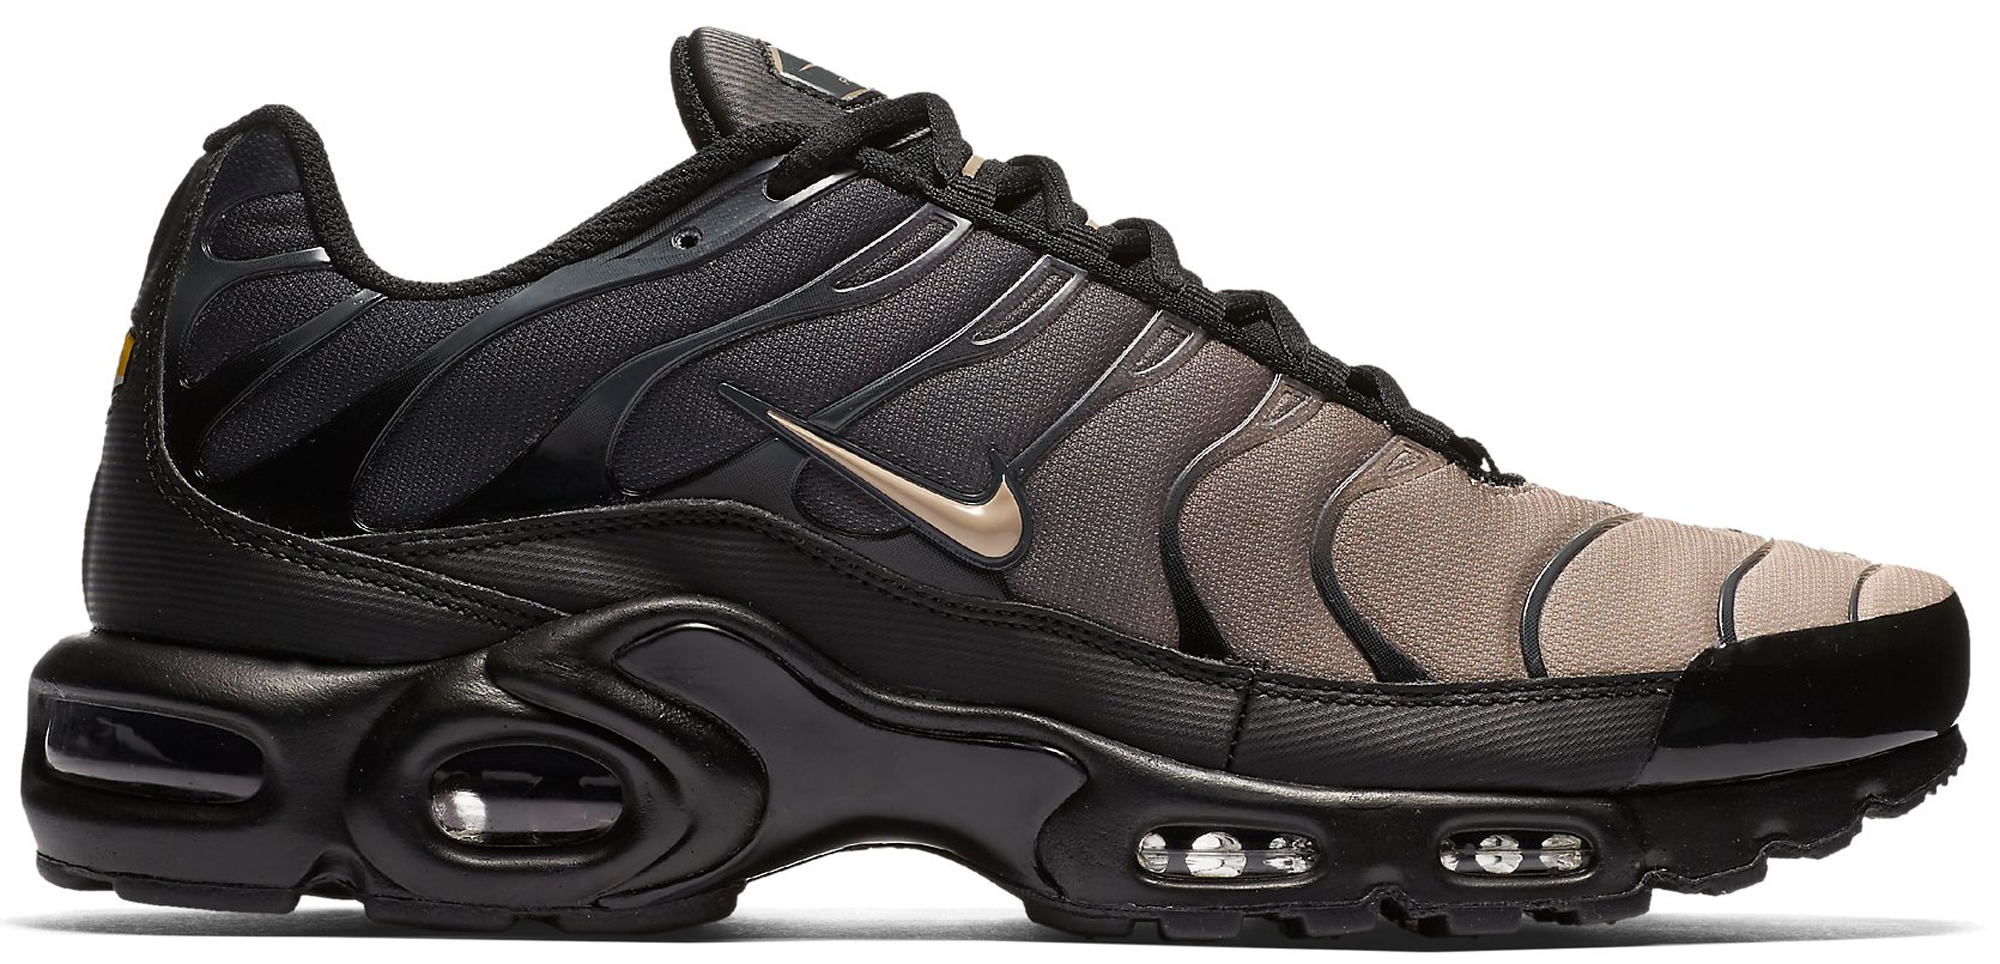 Nike Air Max Plus Gradient Pack (Black